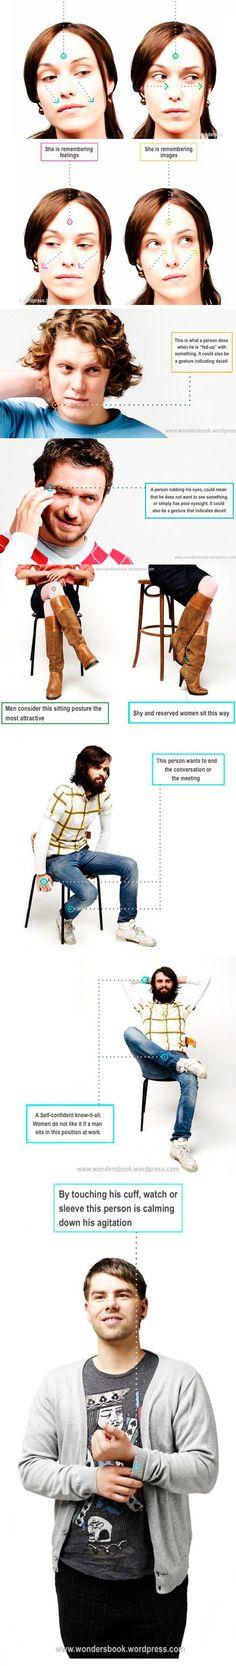 Body Language Secrets - The Meta Picture